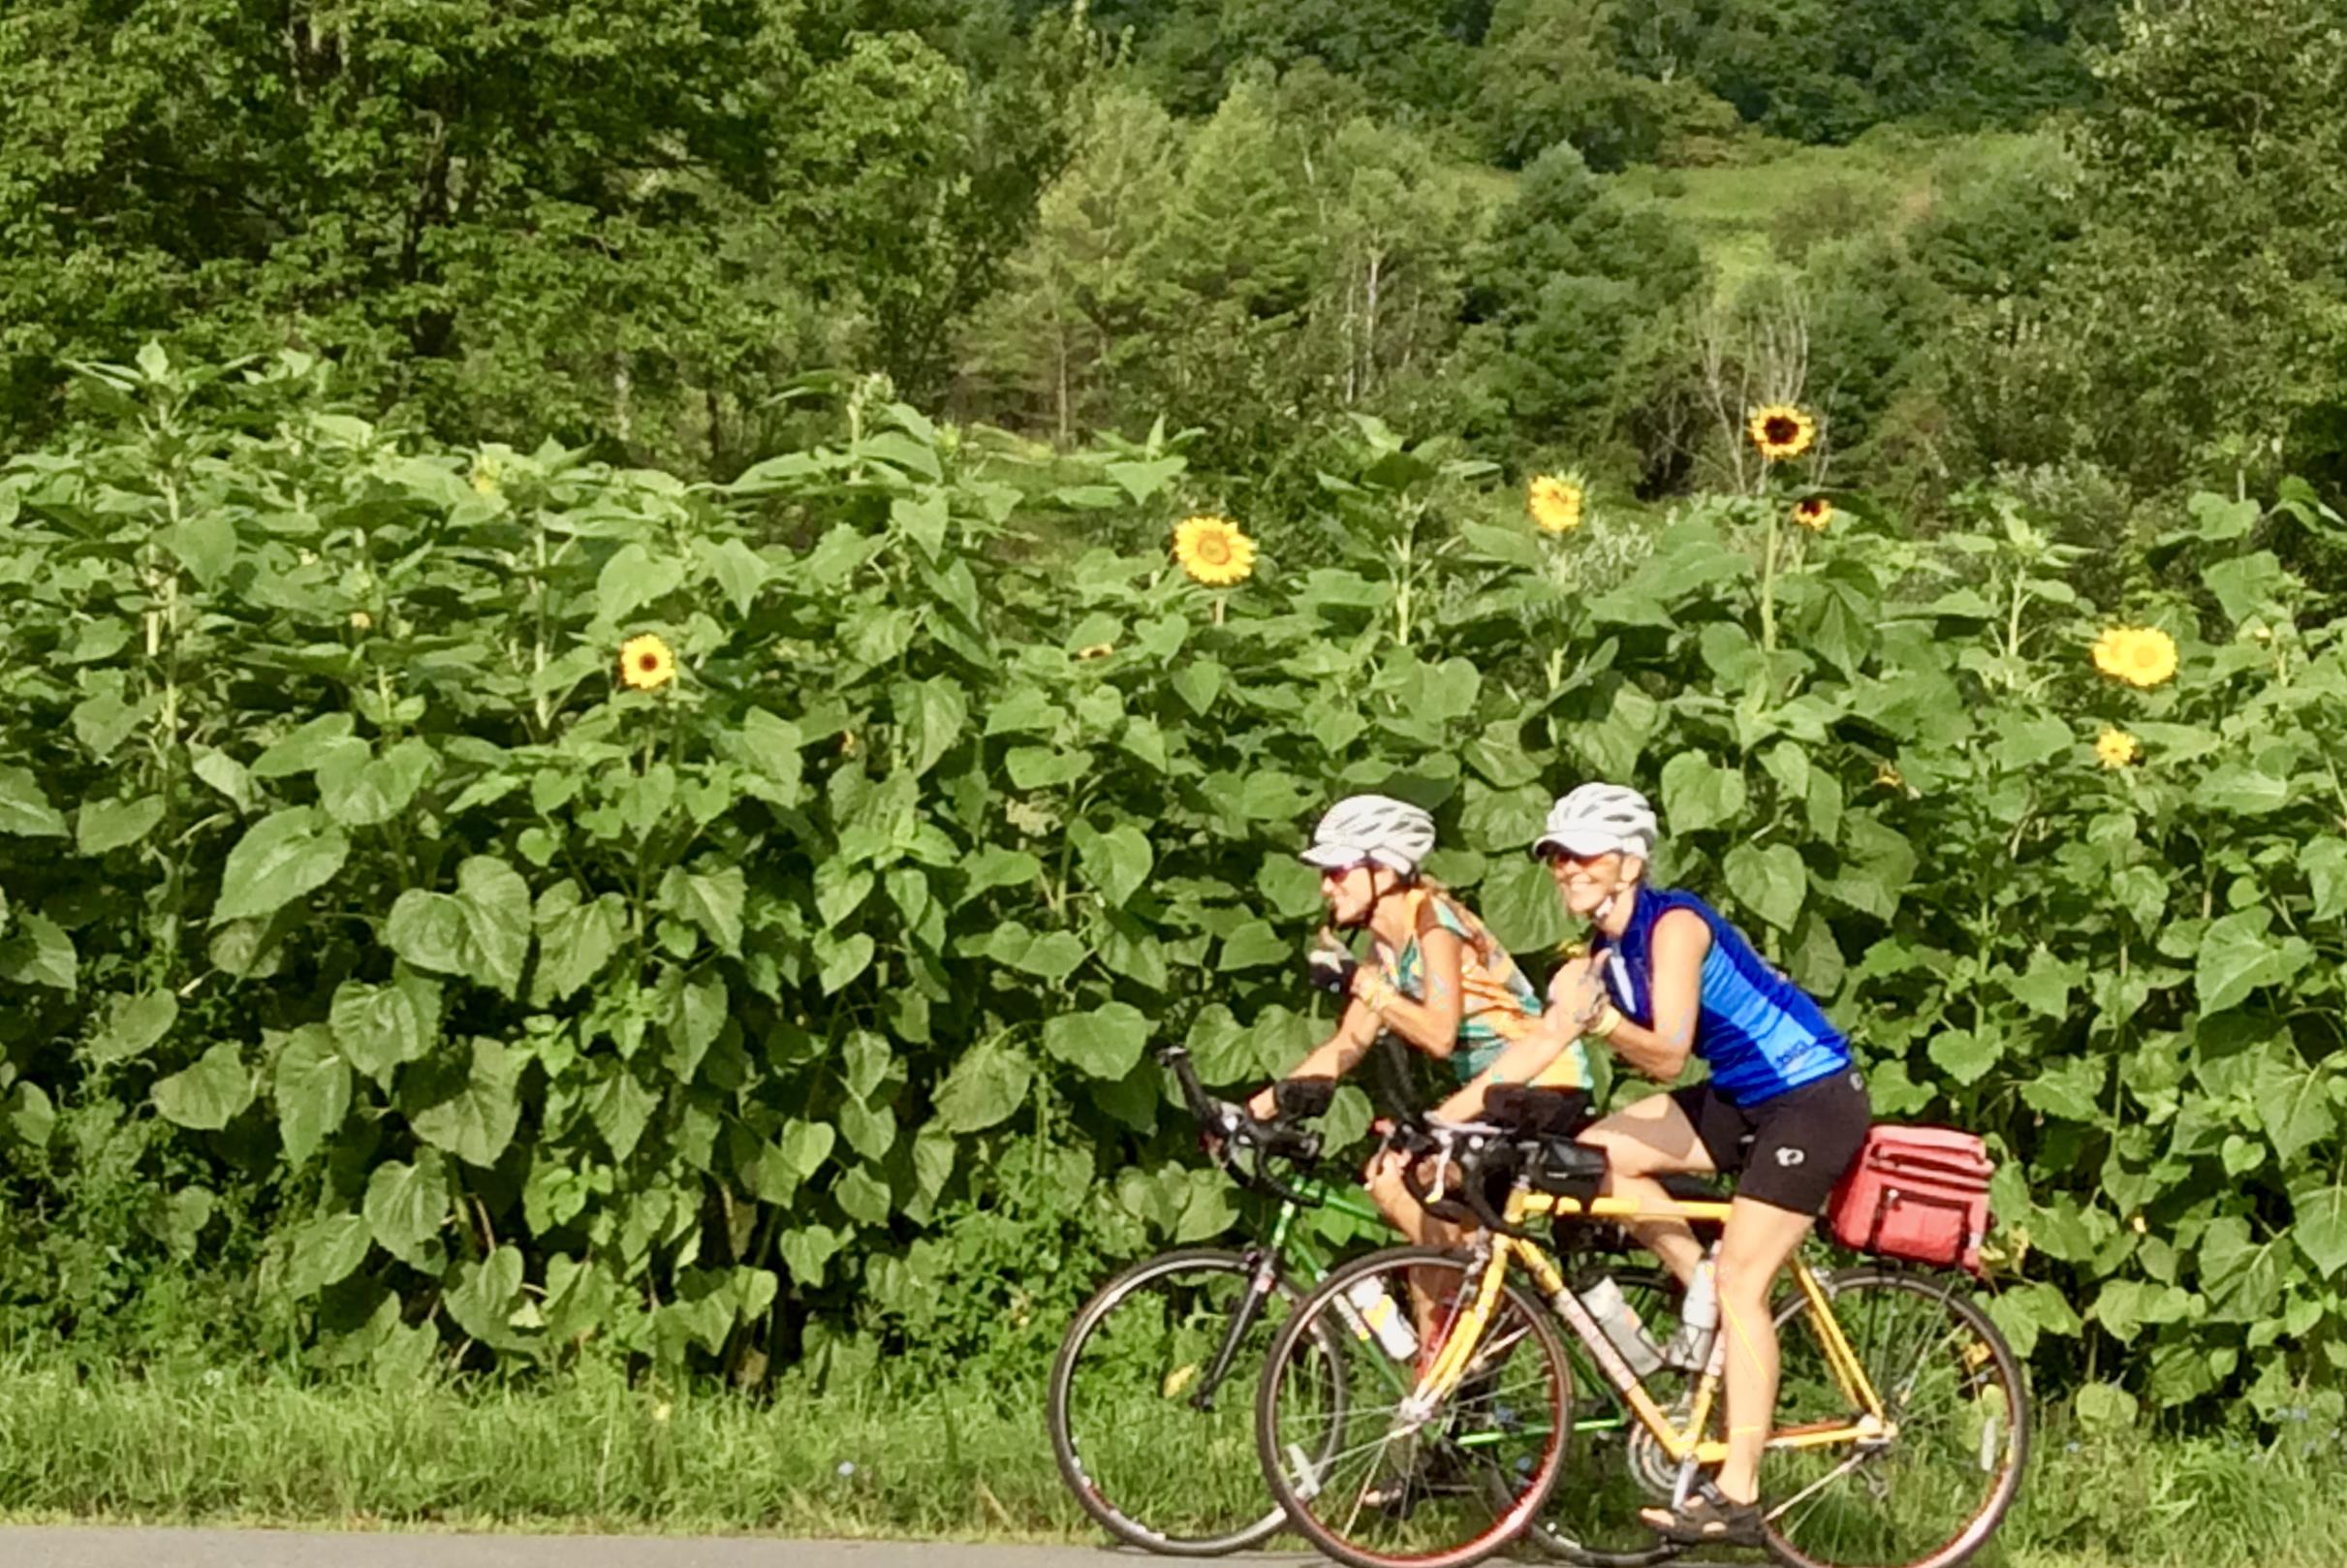 Sunflowers in Eastern New York